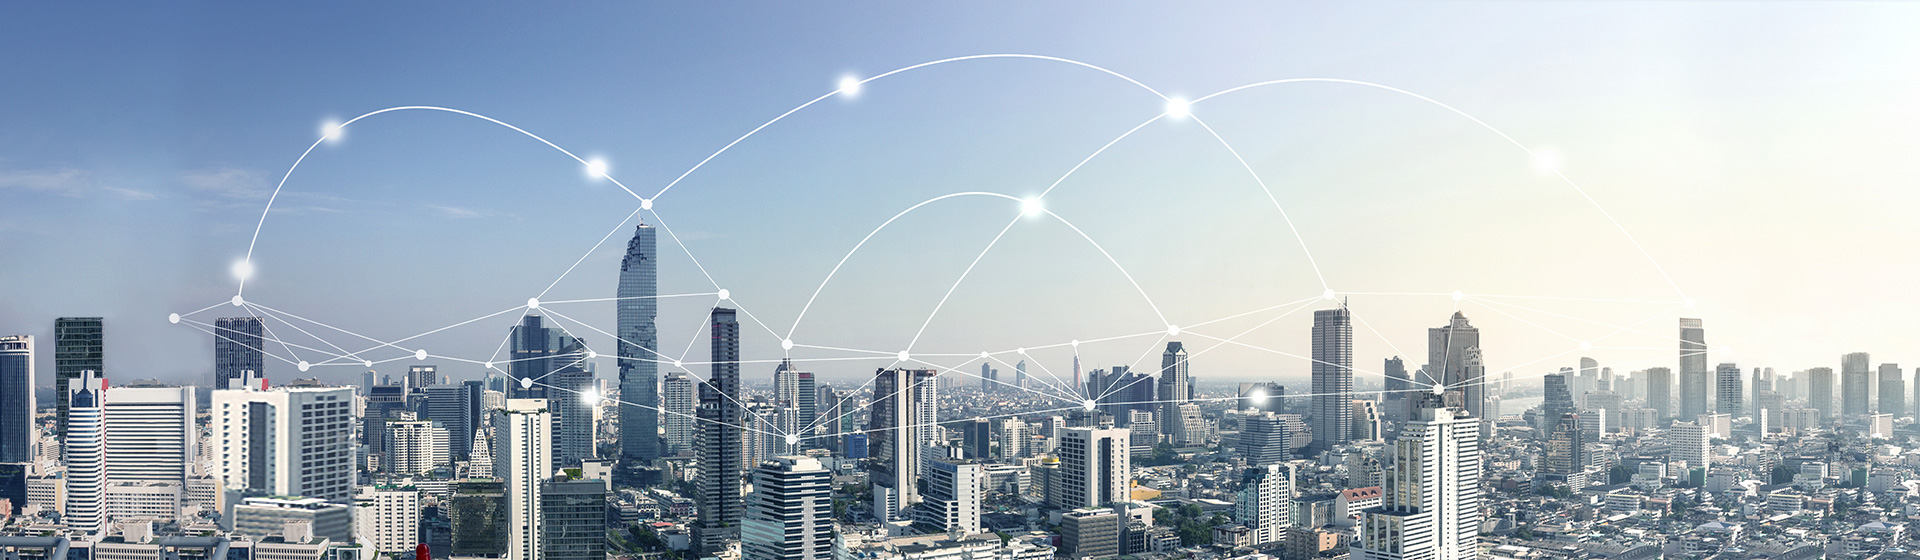 Global 5G & IoT 50